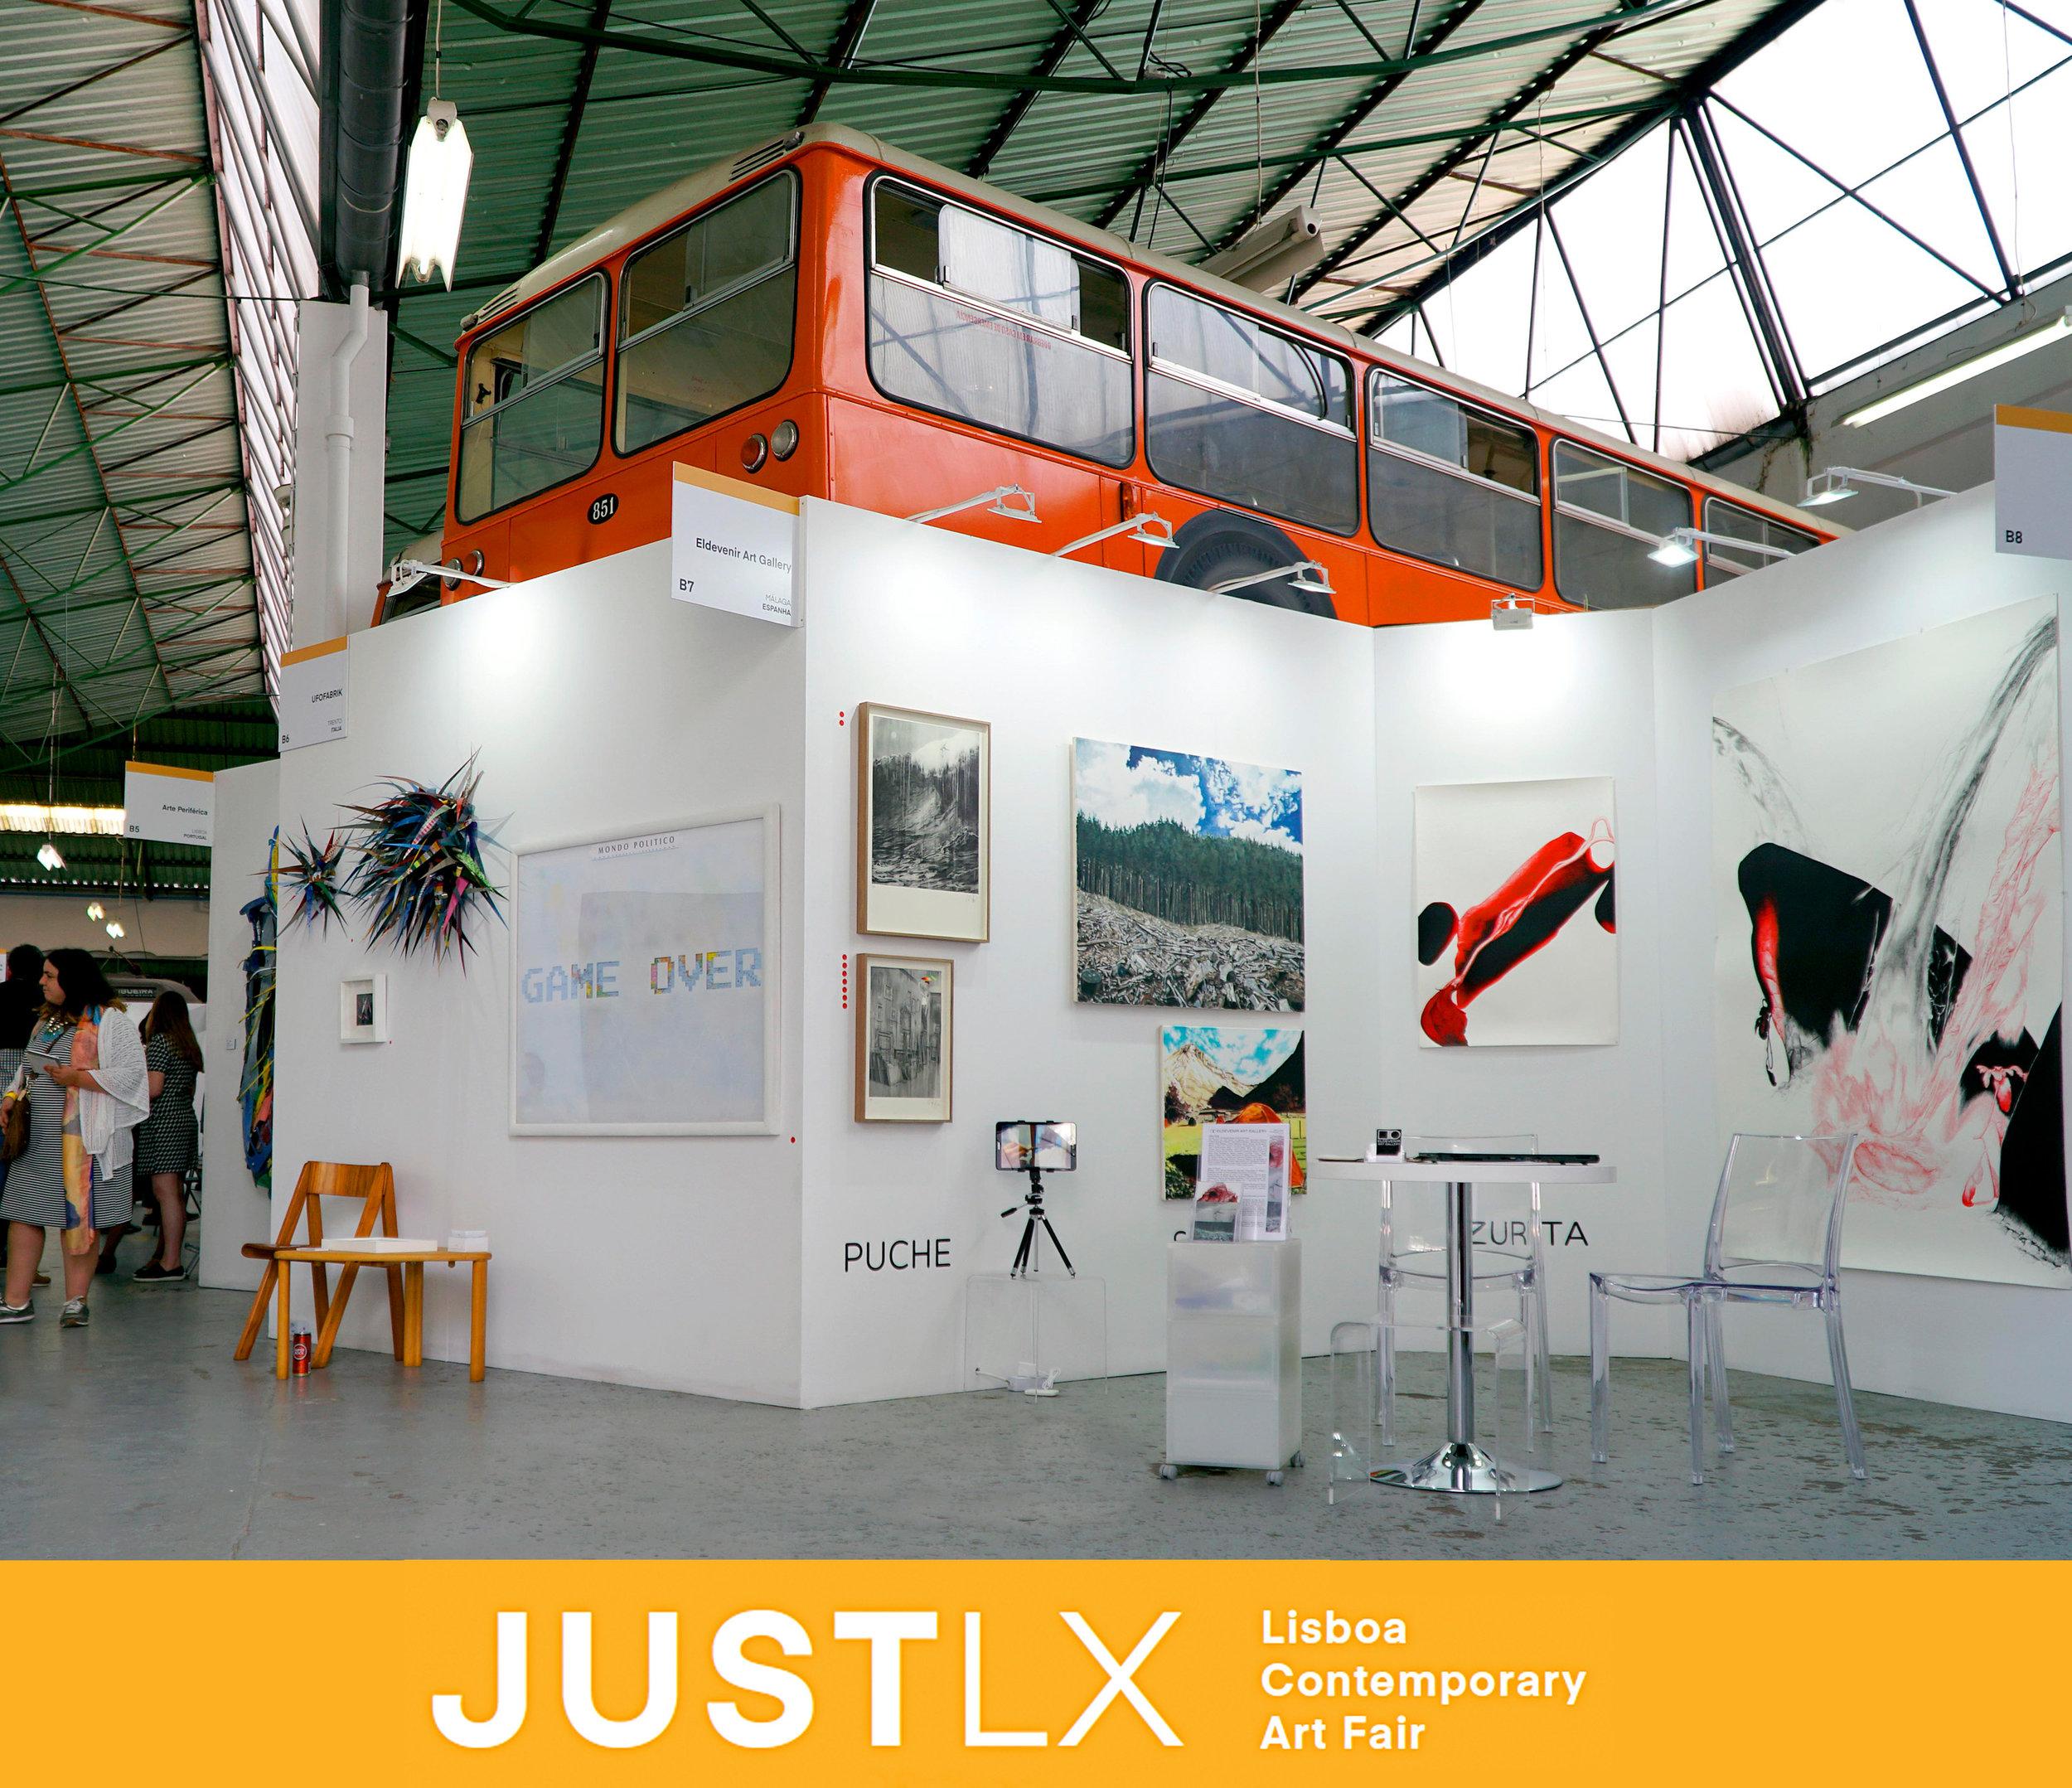 Irene Sánchez + Jesús Zurita + José L. Puche, JUSTLX - 17 - 20 mayo 2018Booth B7Lisboa Contemporay Art FairMuseu da CarrisLisboa, Portugal.